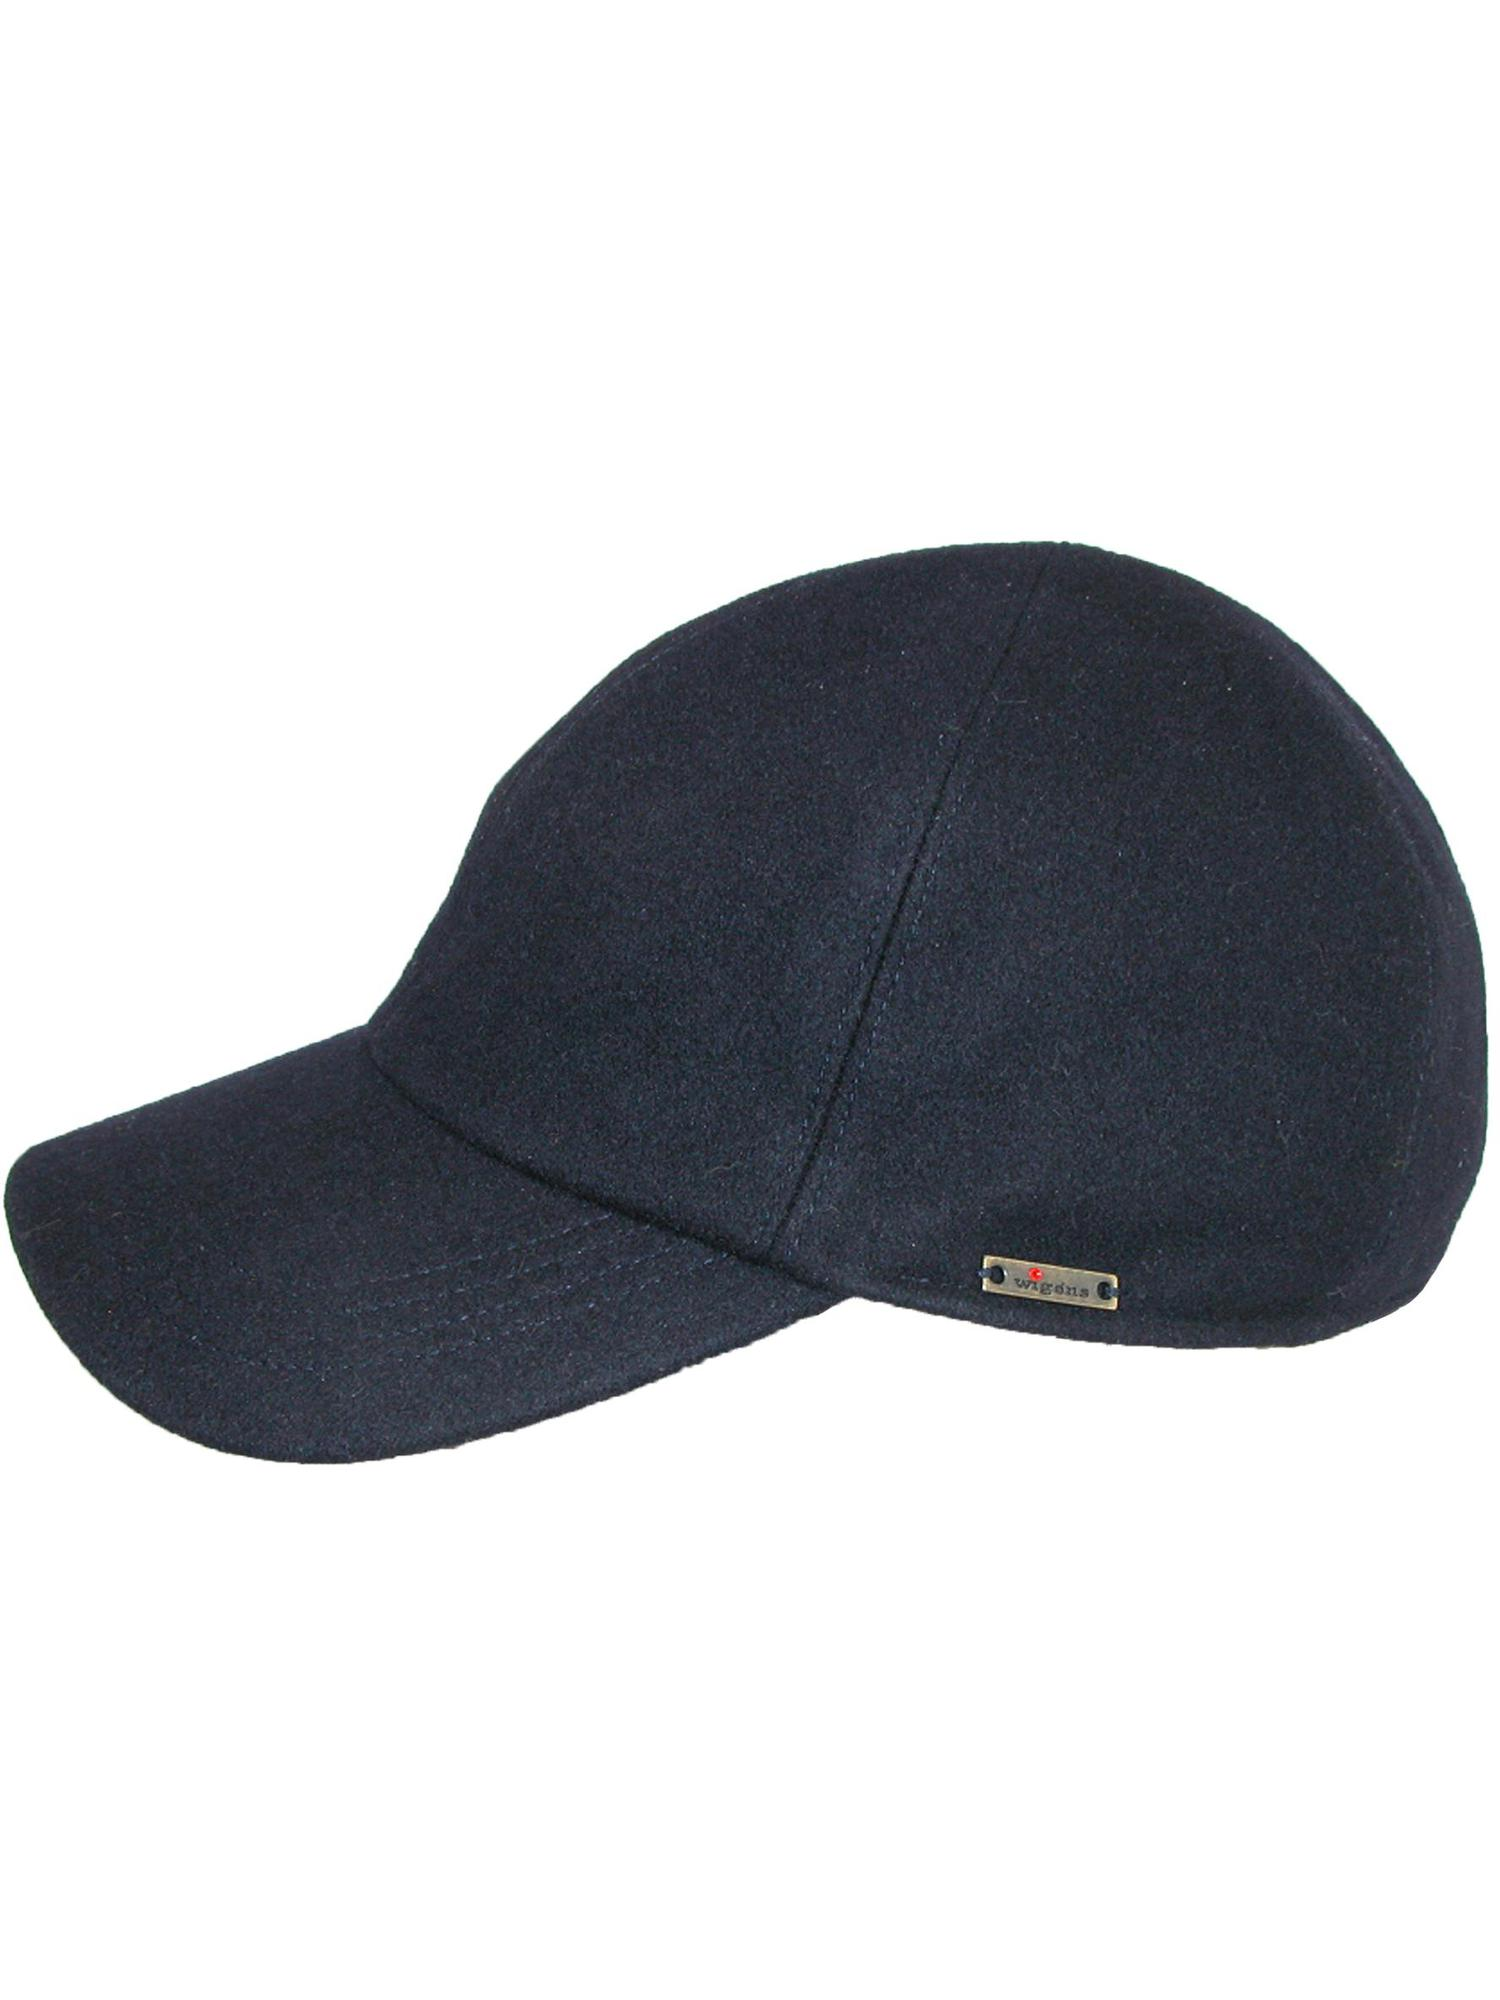 e0b6ac68856332 WIGENS - Size 56 Mens Kent (Edgar) Wool Baseball Cap with Earflaps, Black -  Walmart.com